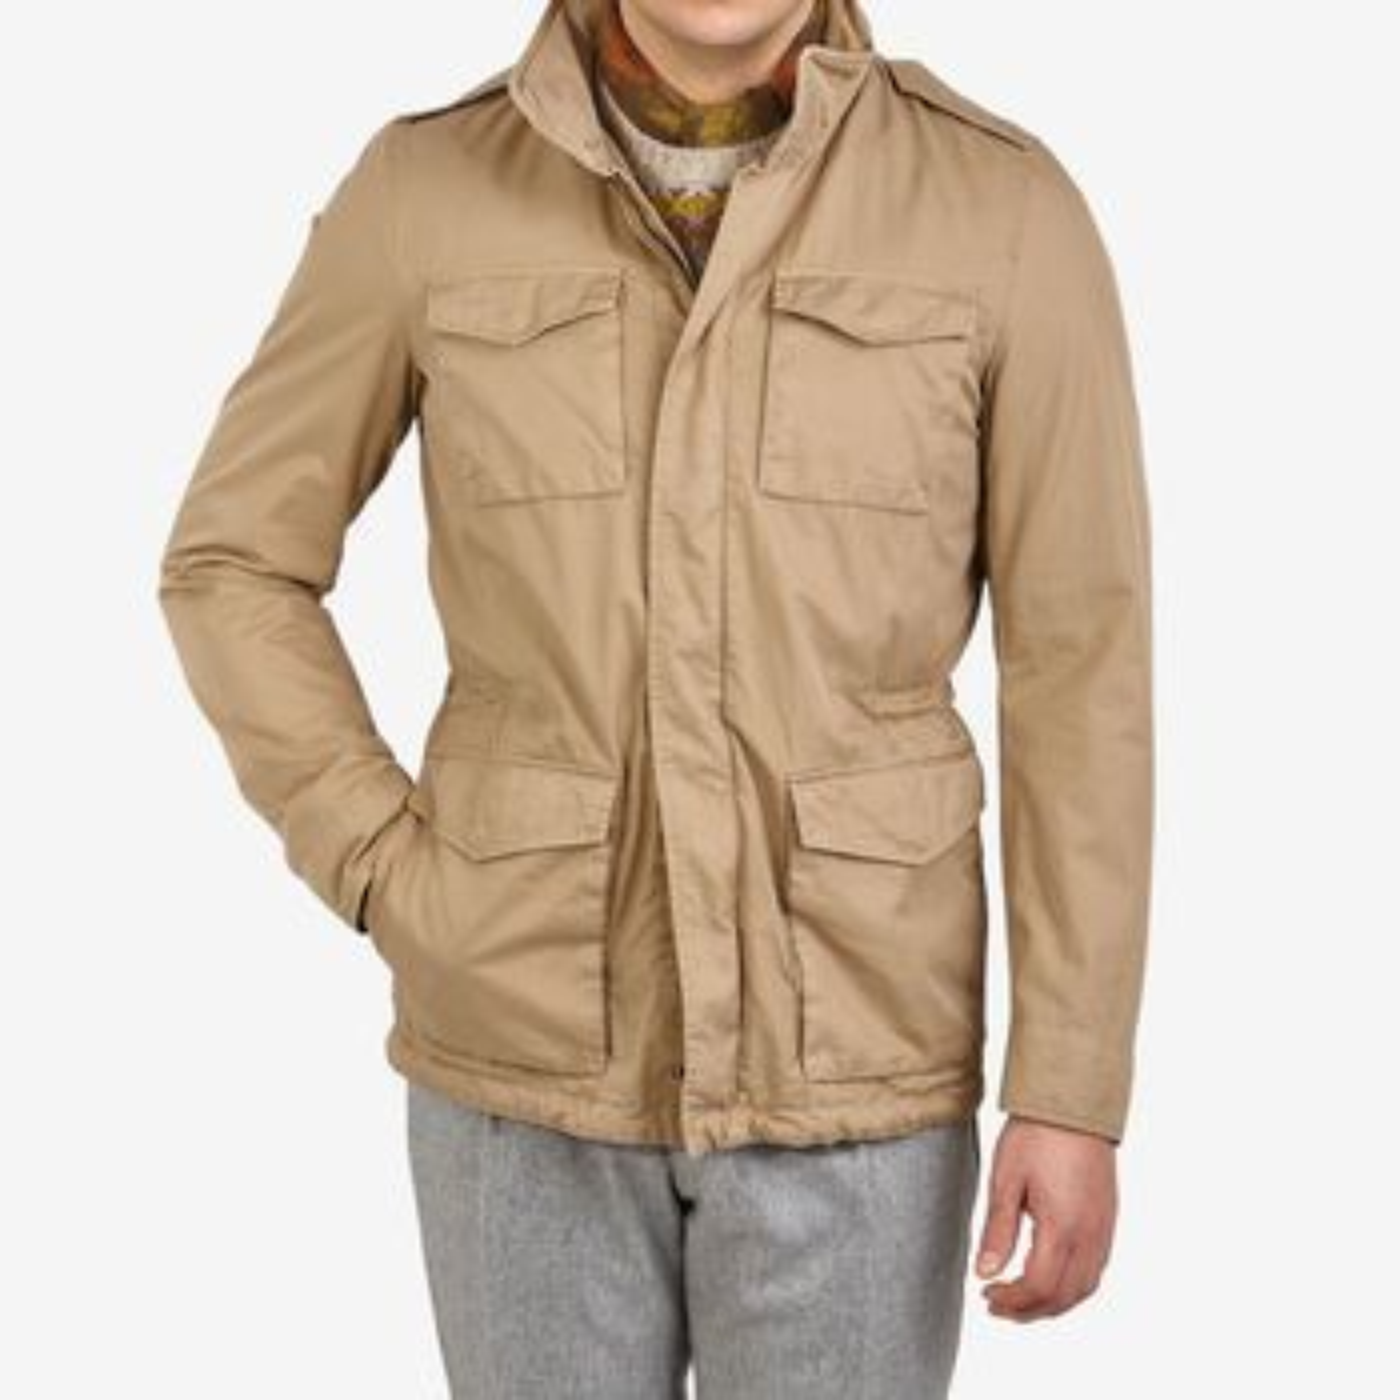 Herno Khaki Washed Cotton Field Jacket Front